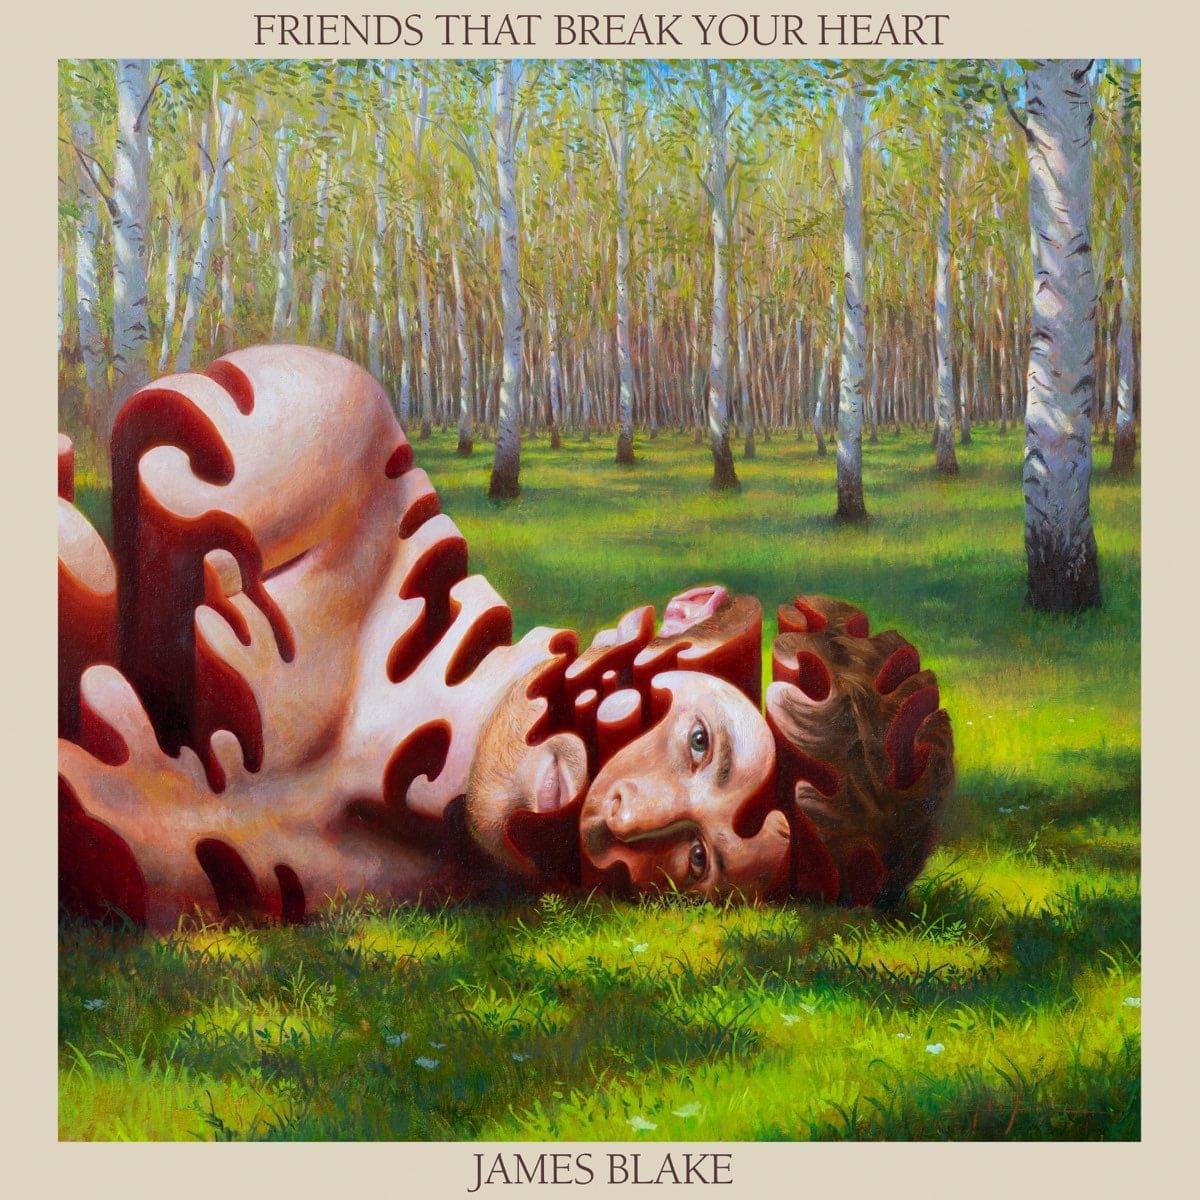 Album Review: James Blake, 'Friends That Break Your Heart'